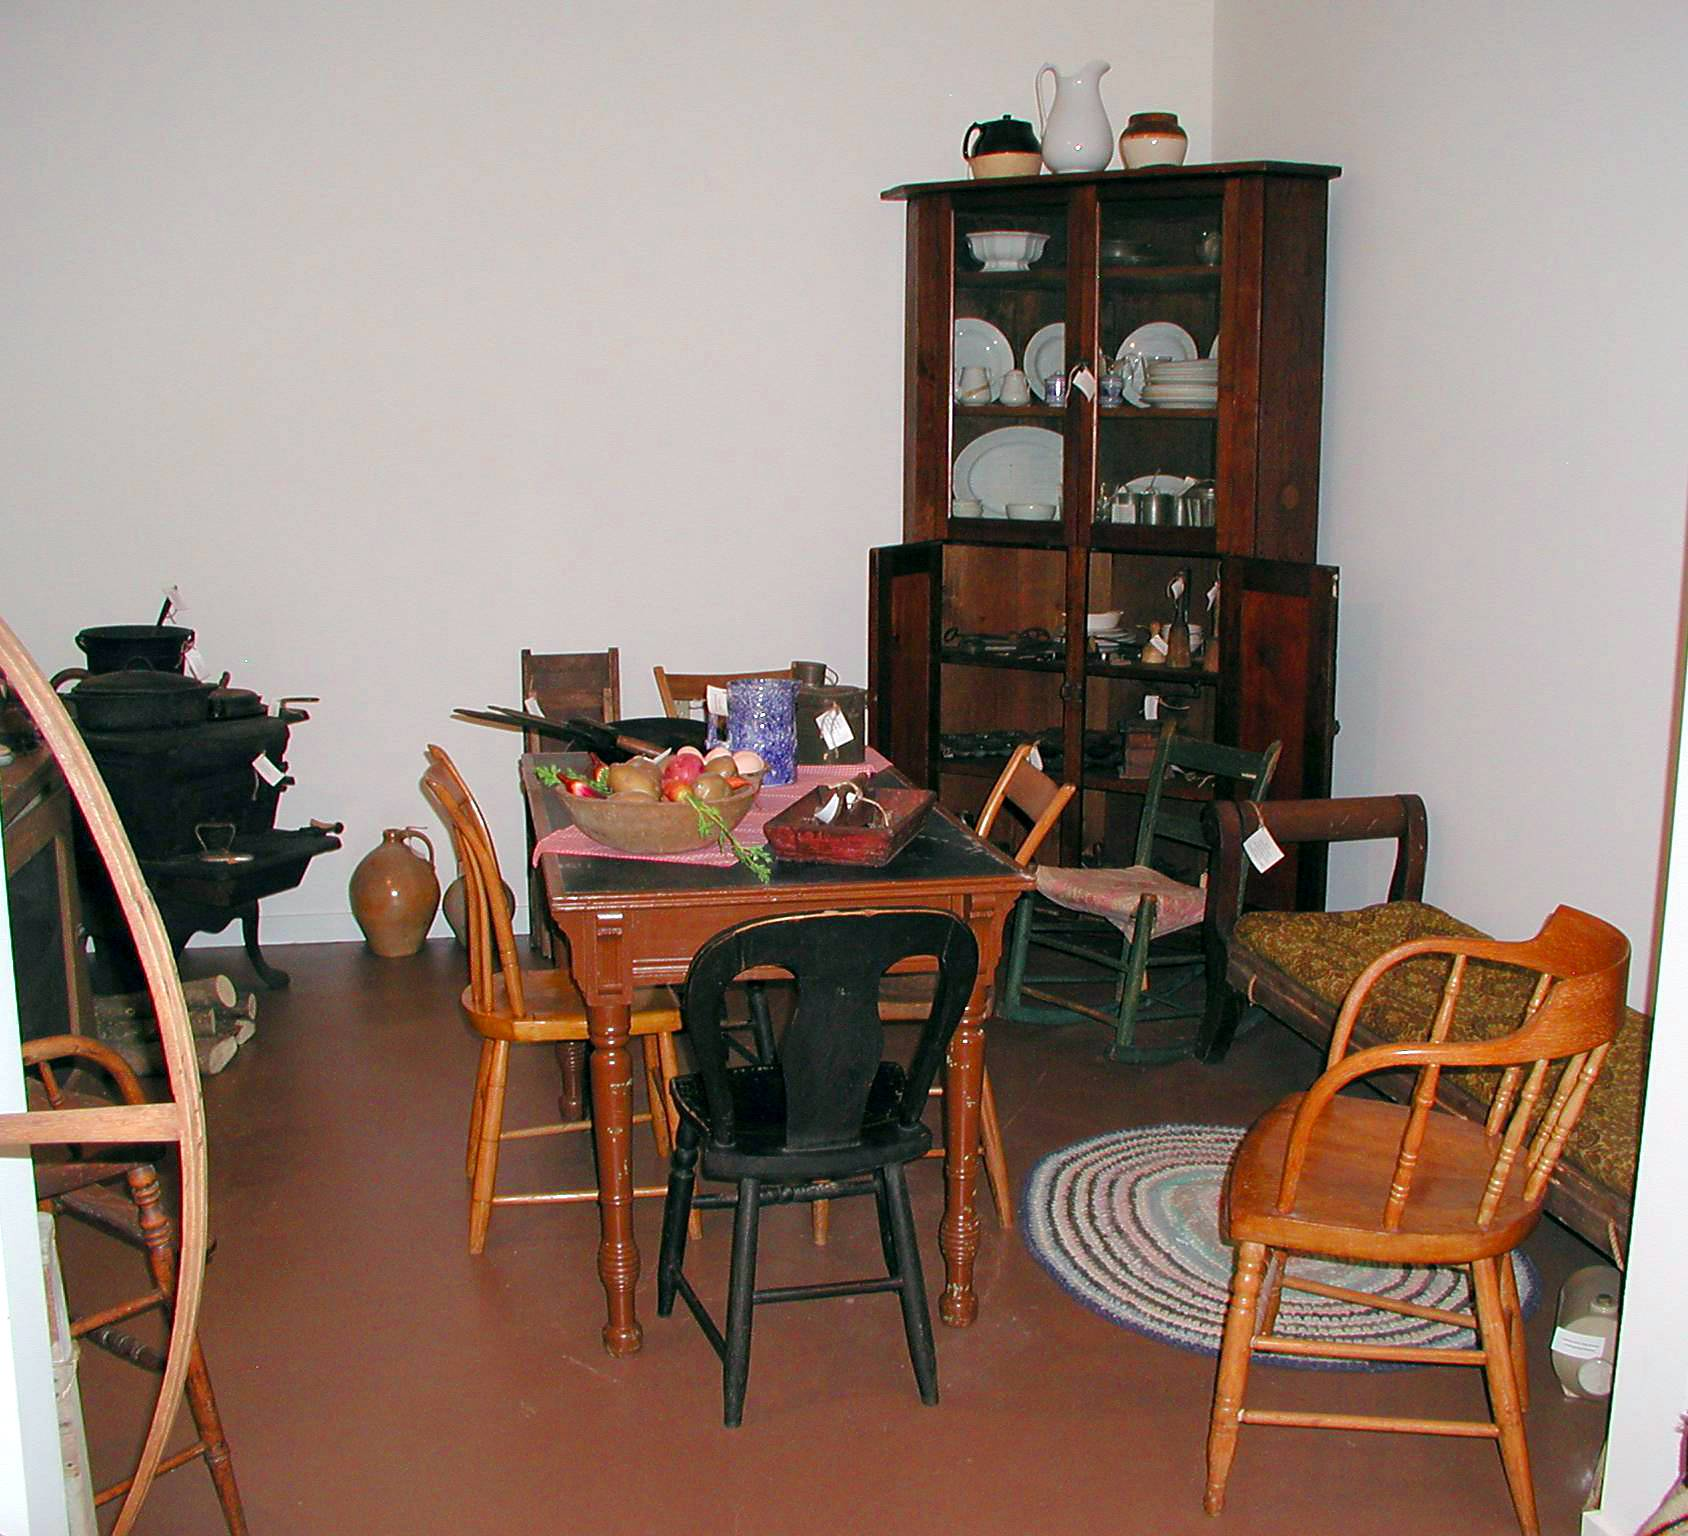 Rockton Township Historical Society Carriage House Exhibits